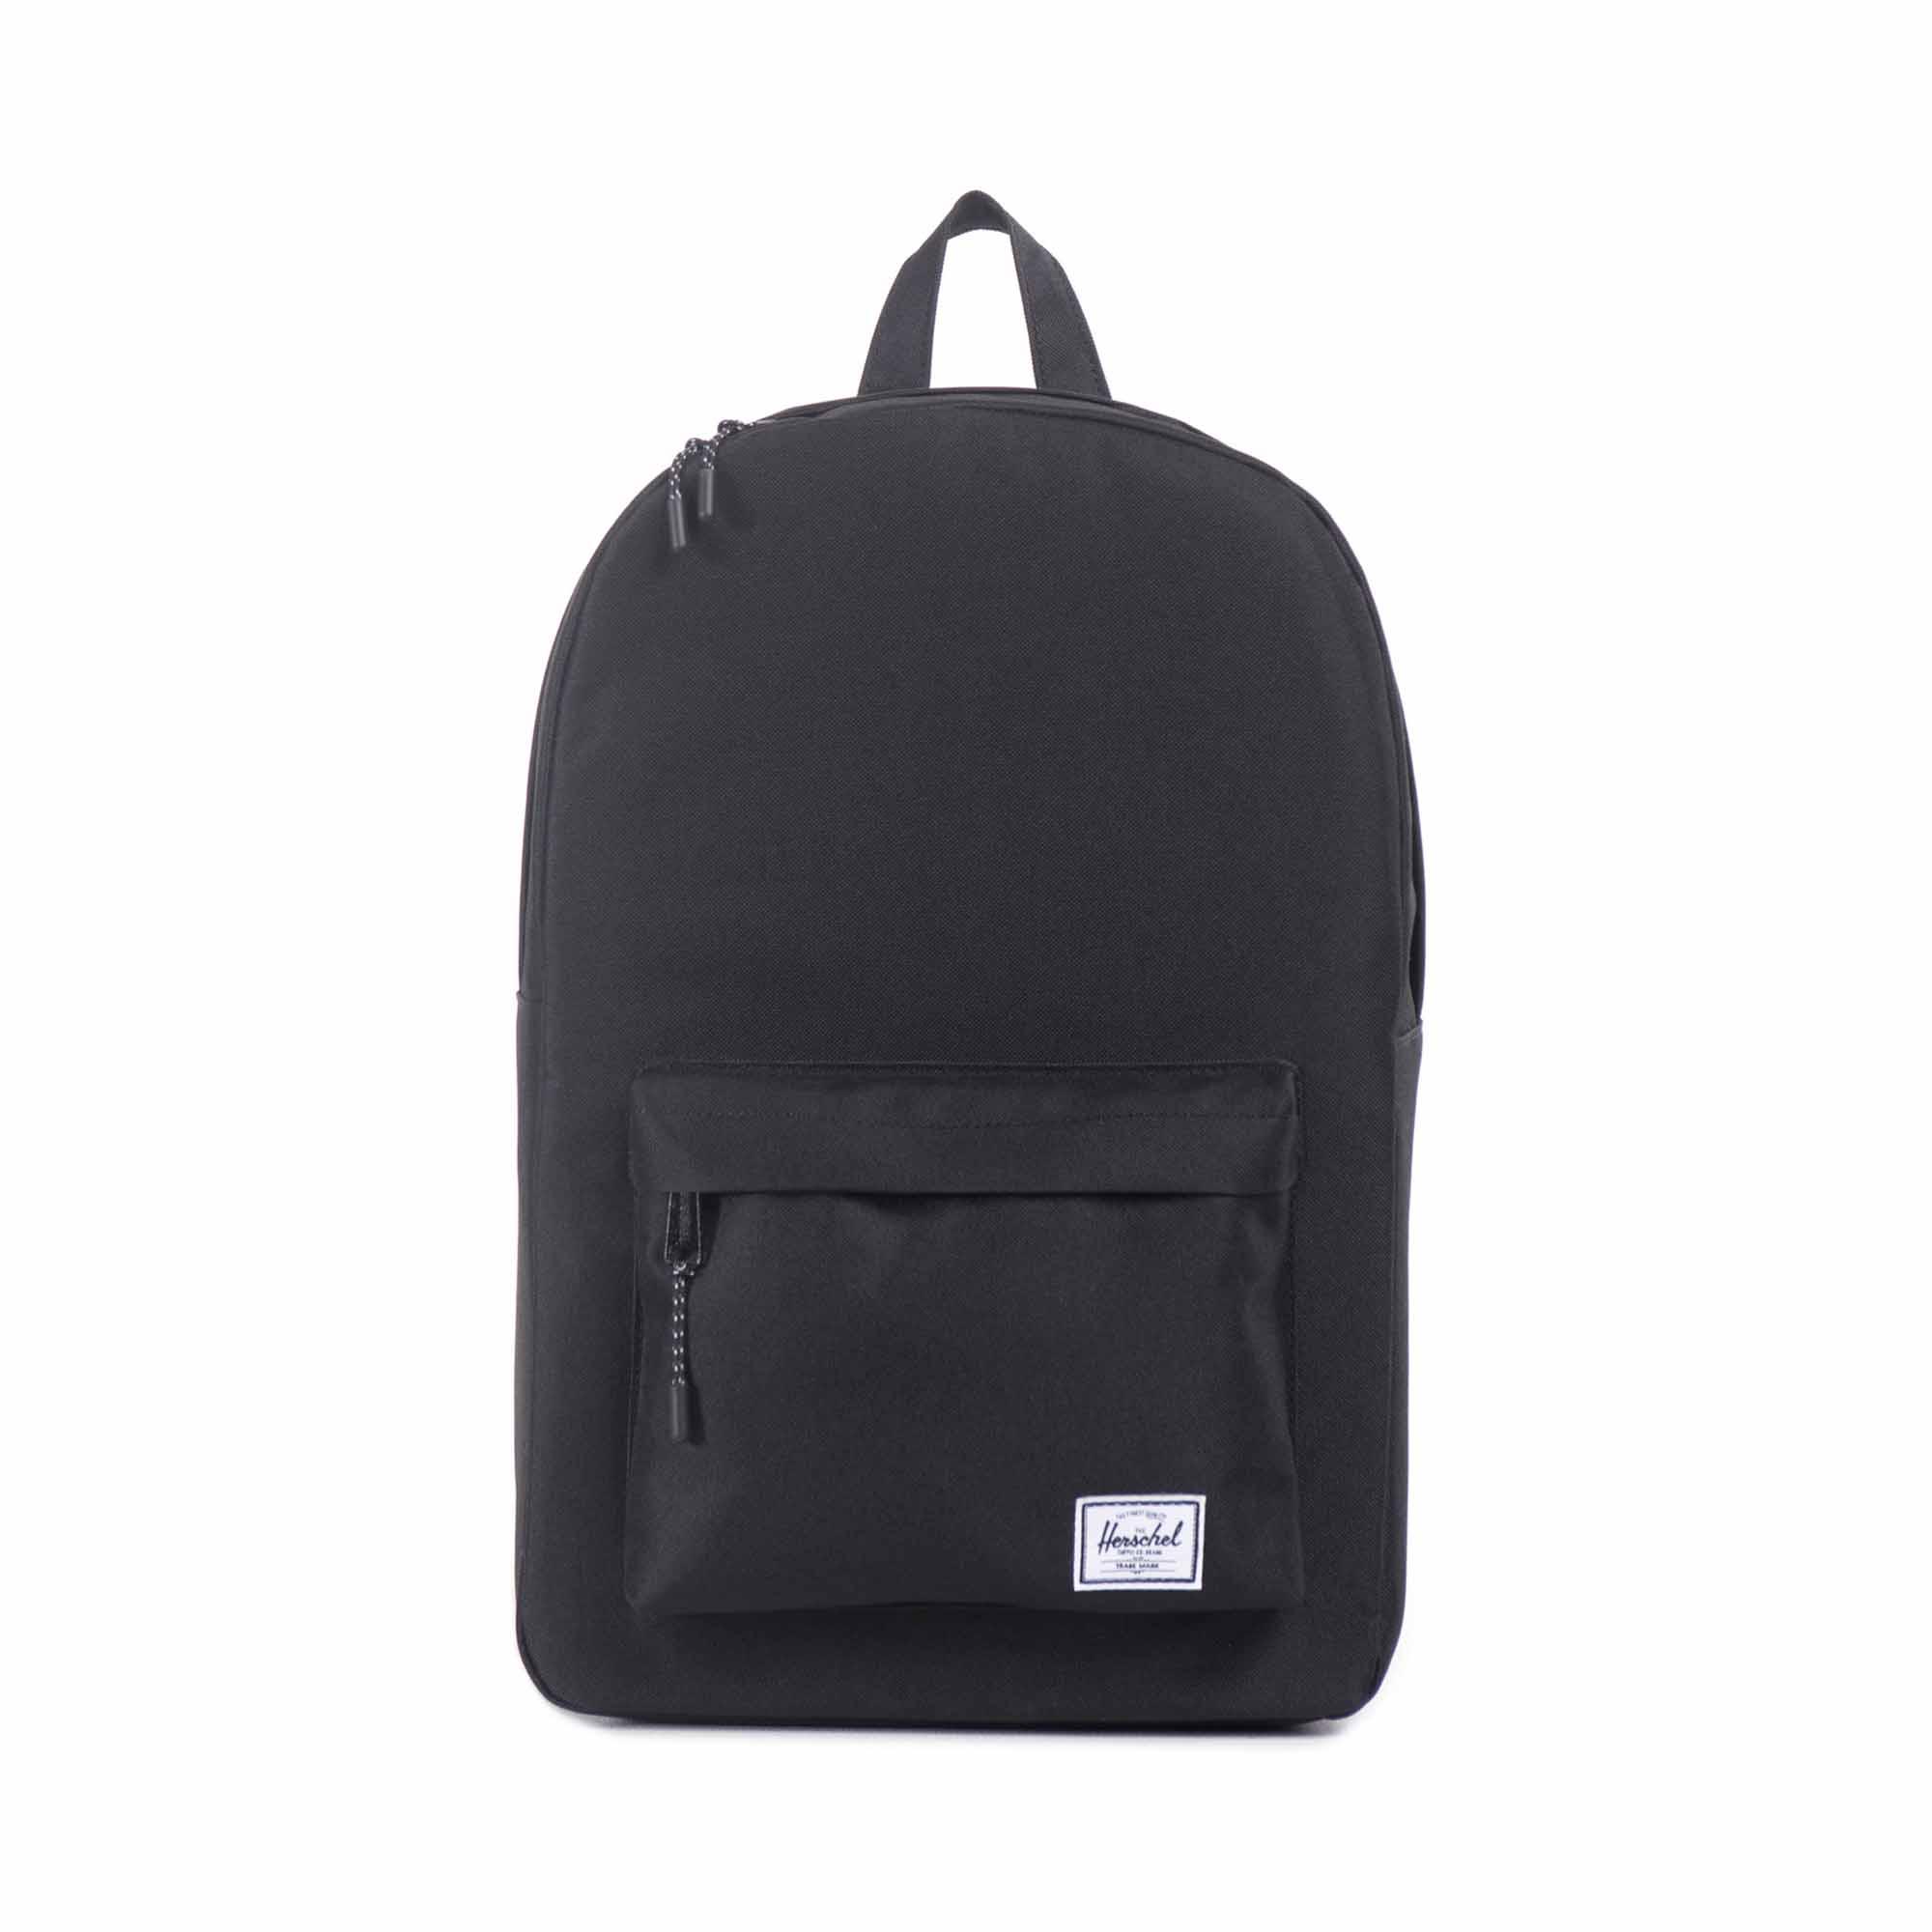 3777454e5f0 Classic Backpack Mid-Volume